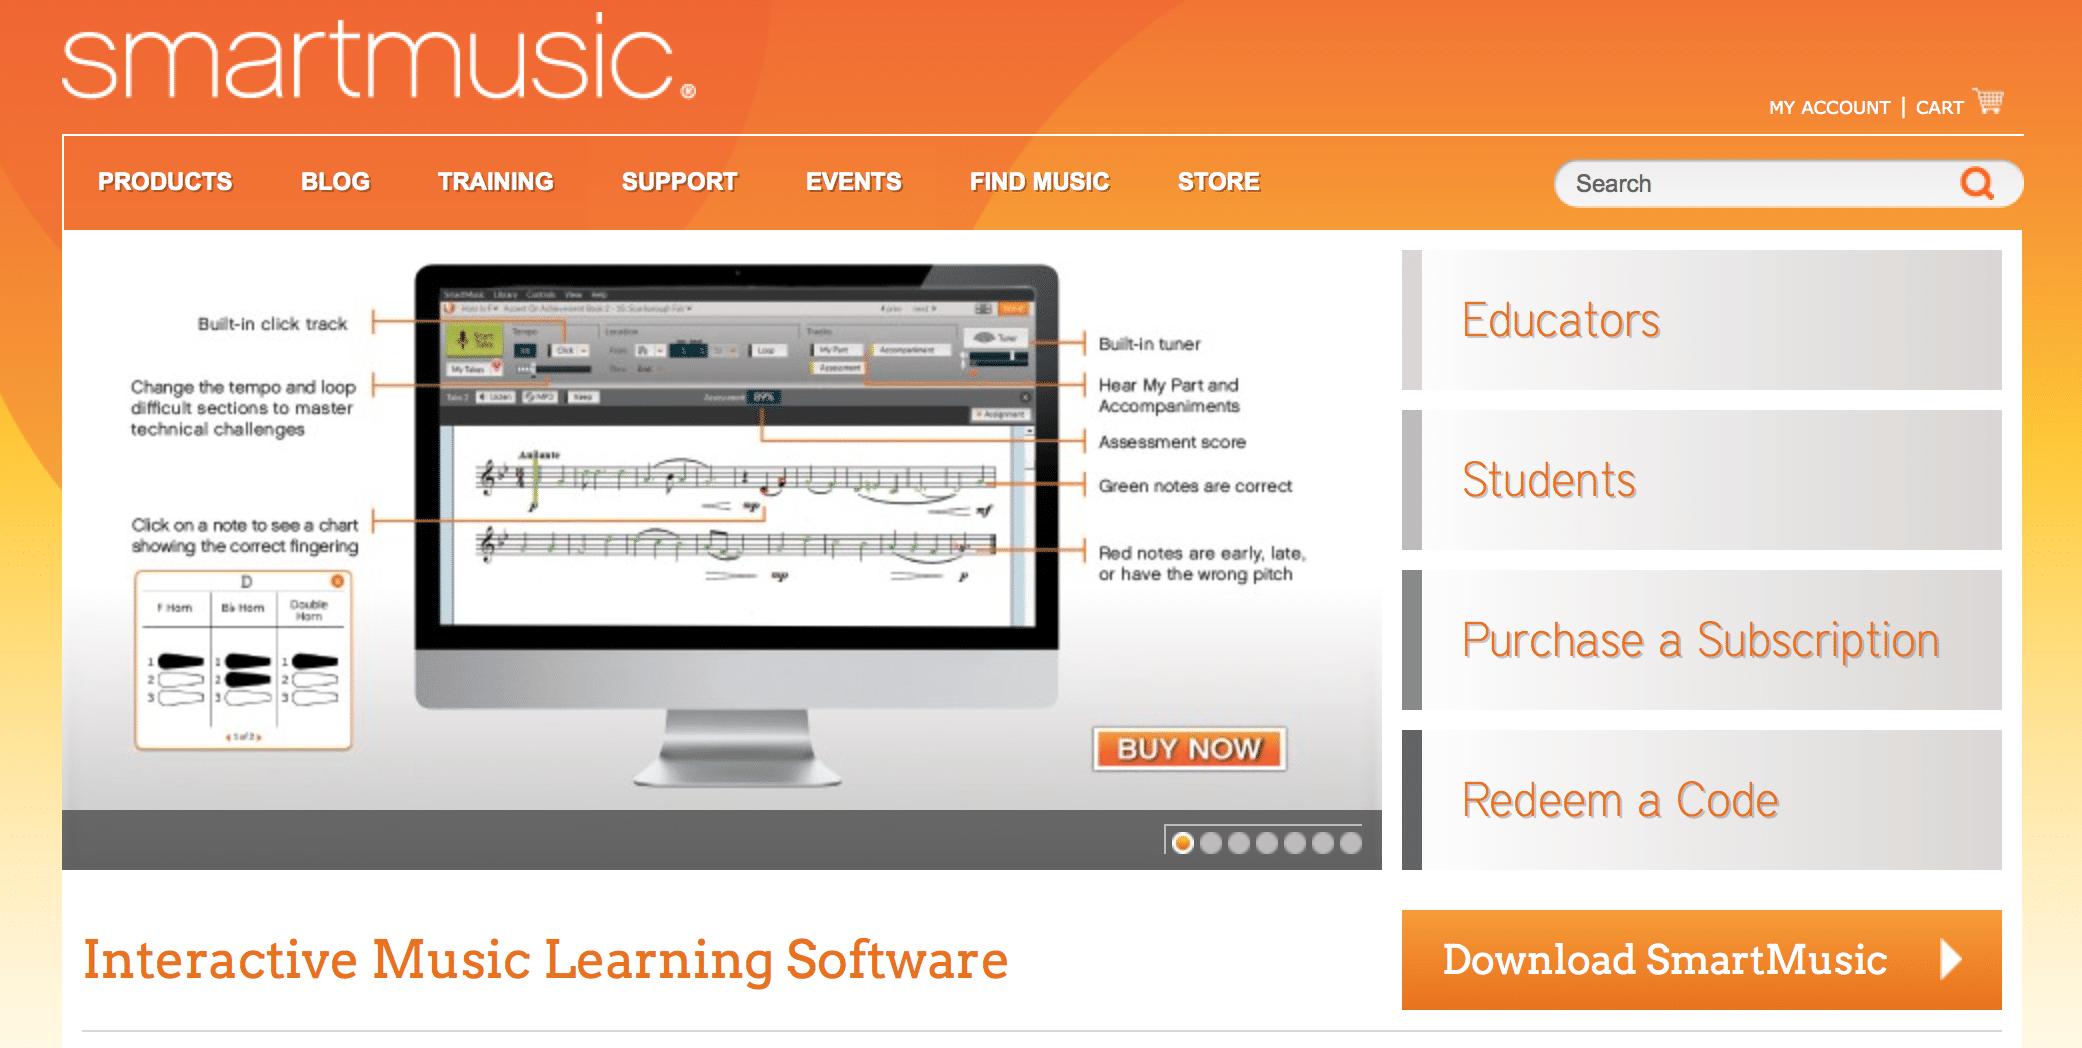 10+ Essential Fluencies Resources for Music Teachers to Explore